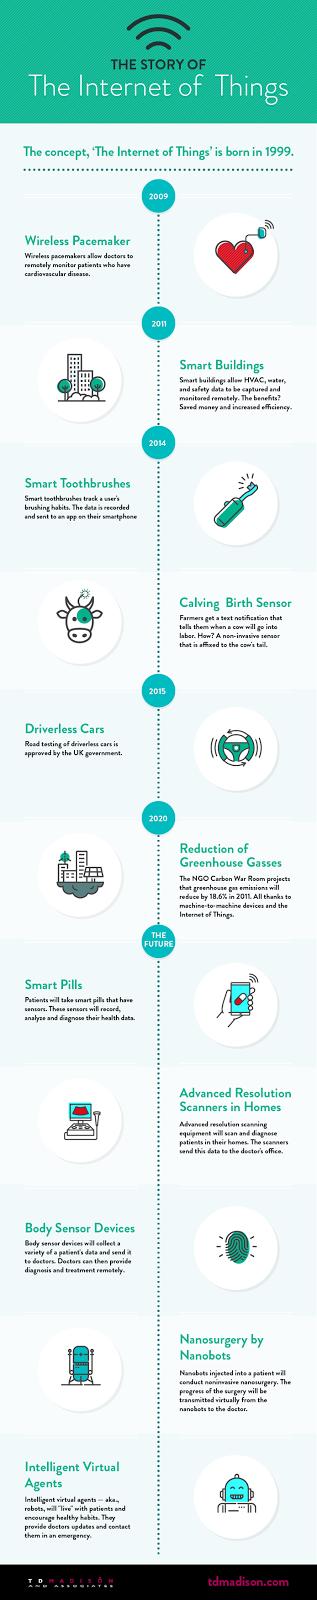 La història de la IoT